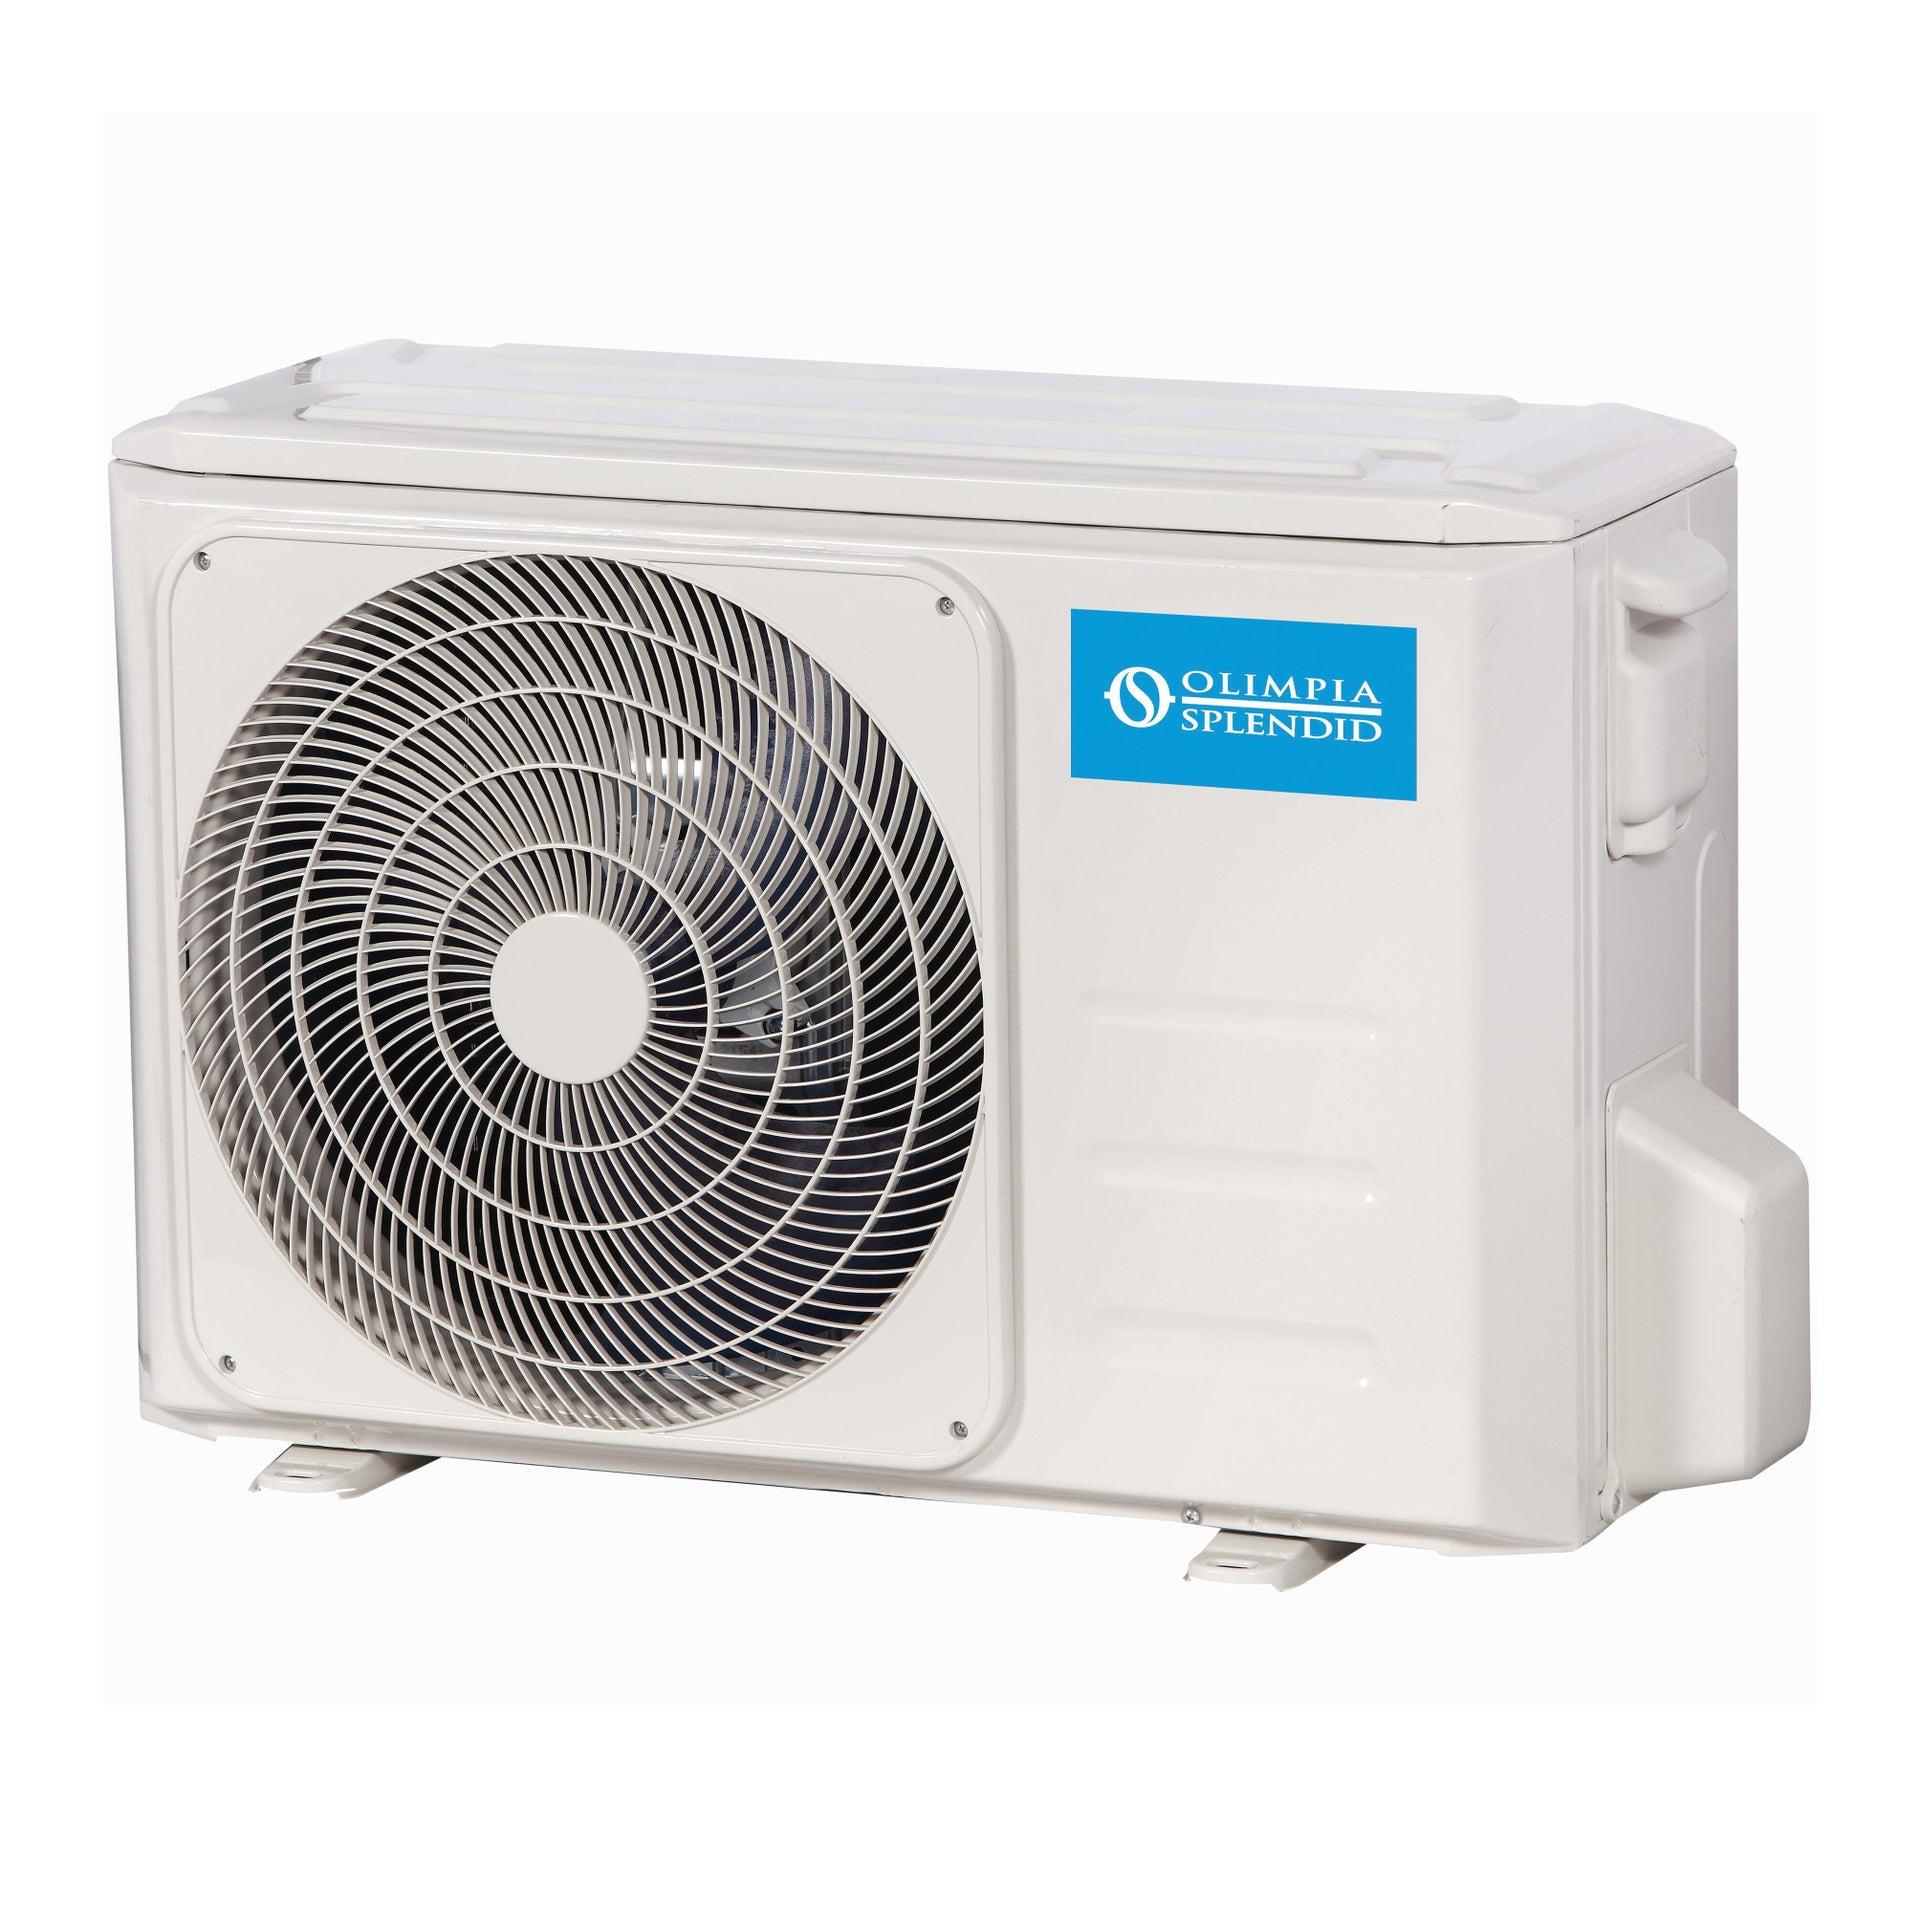 Climatizzatore trialsplit OLIMPIA SPLENDID Aryal 21000 BTU - 3